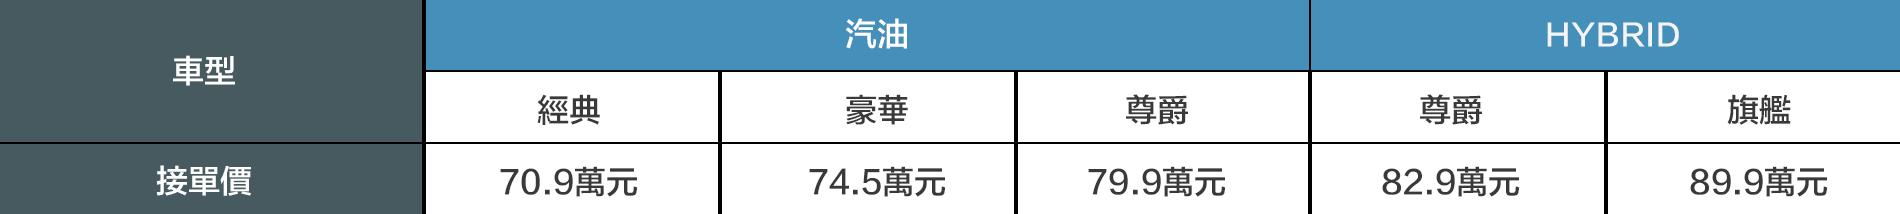 price_1.png